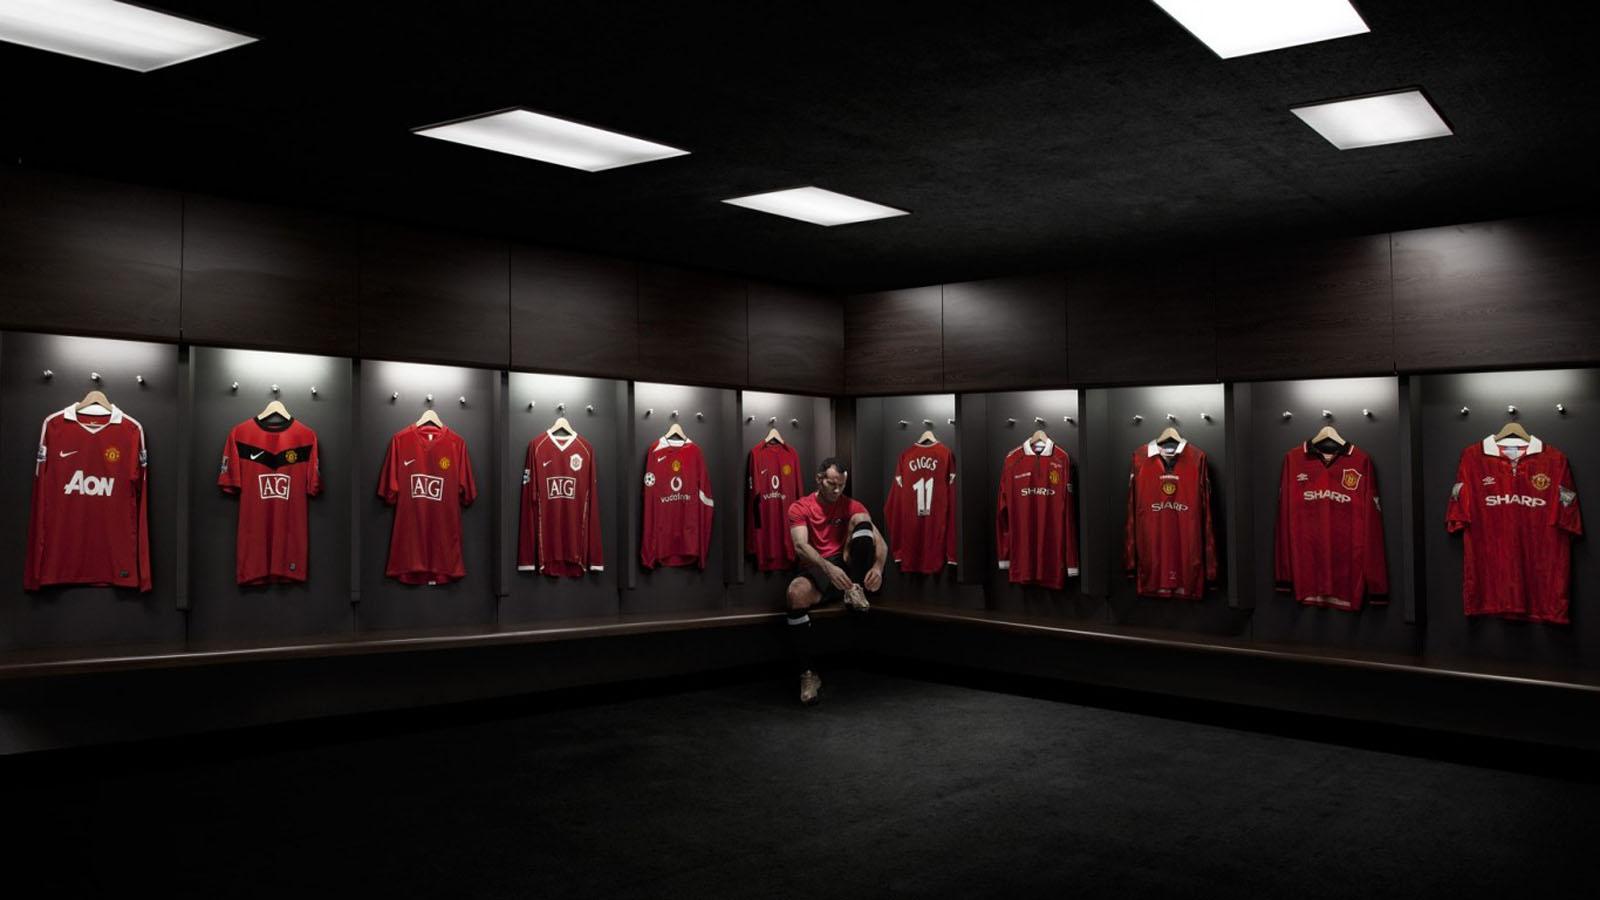 Football Club Group Latest HD Wallpaper 2015 Sports HD Wallpapers 1600x900